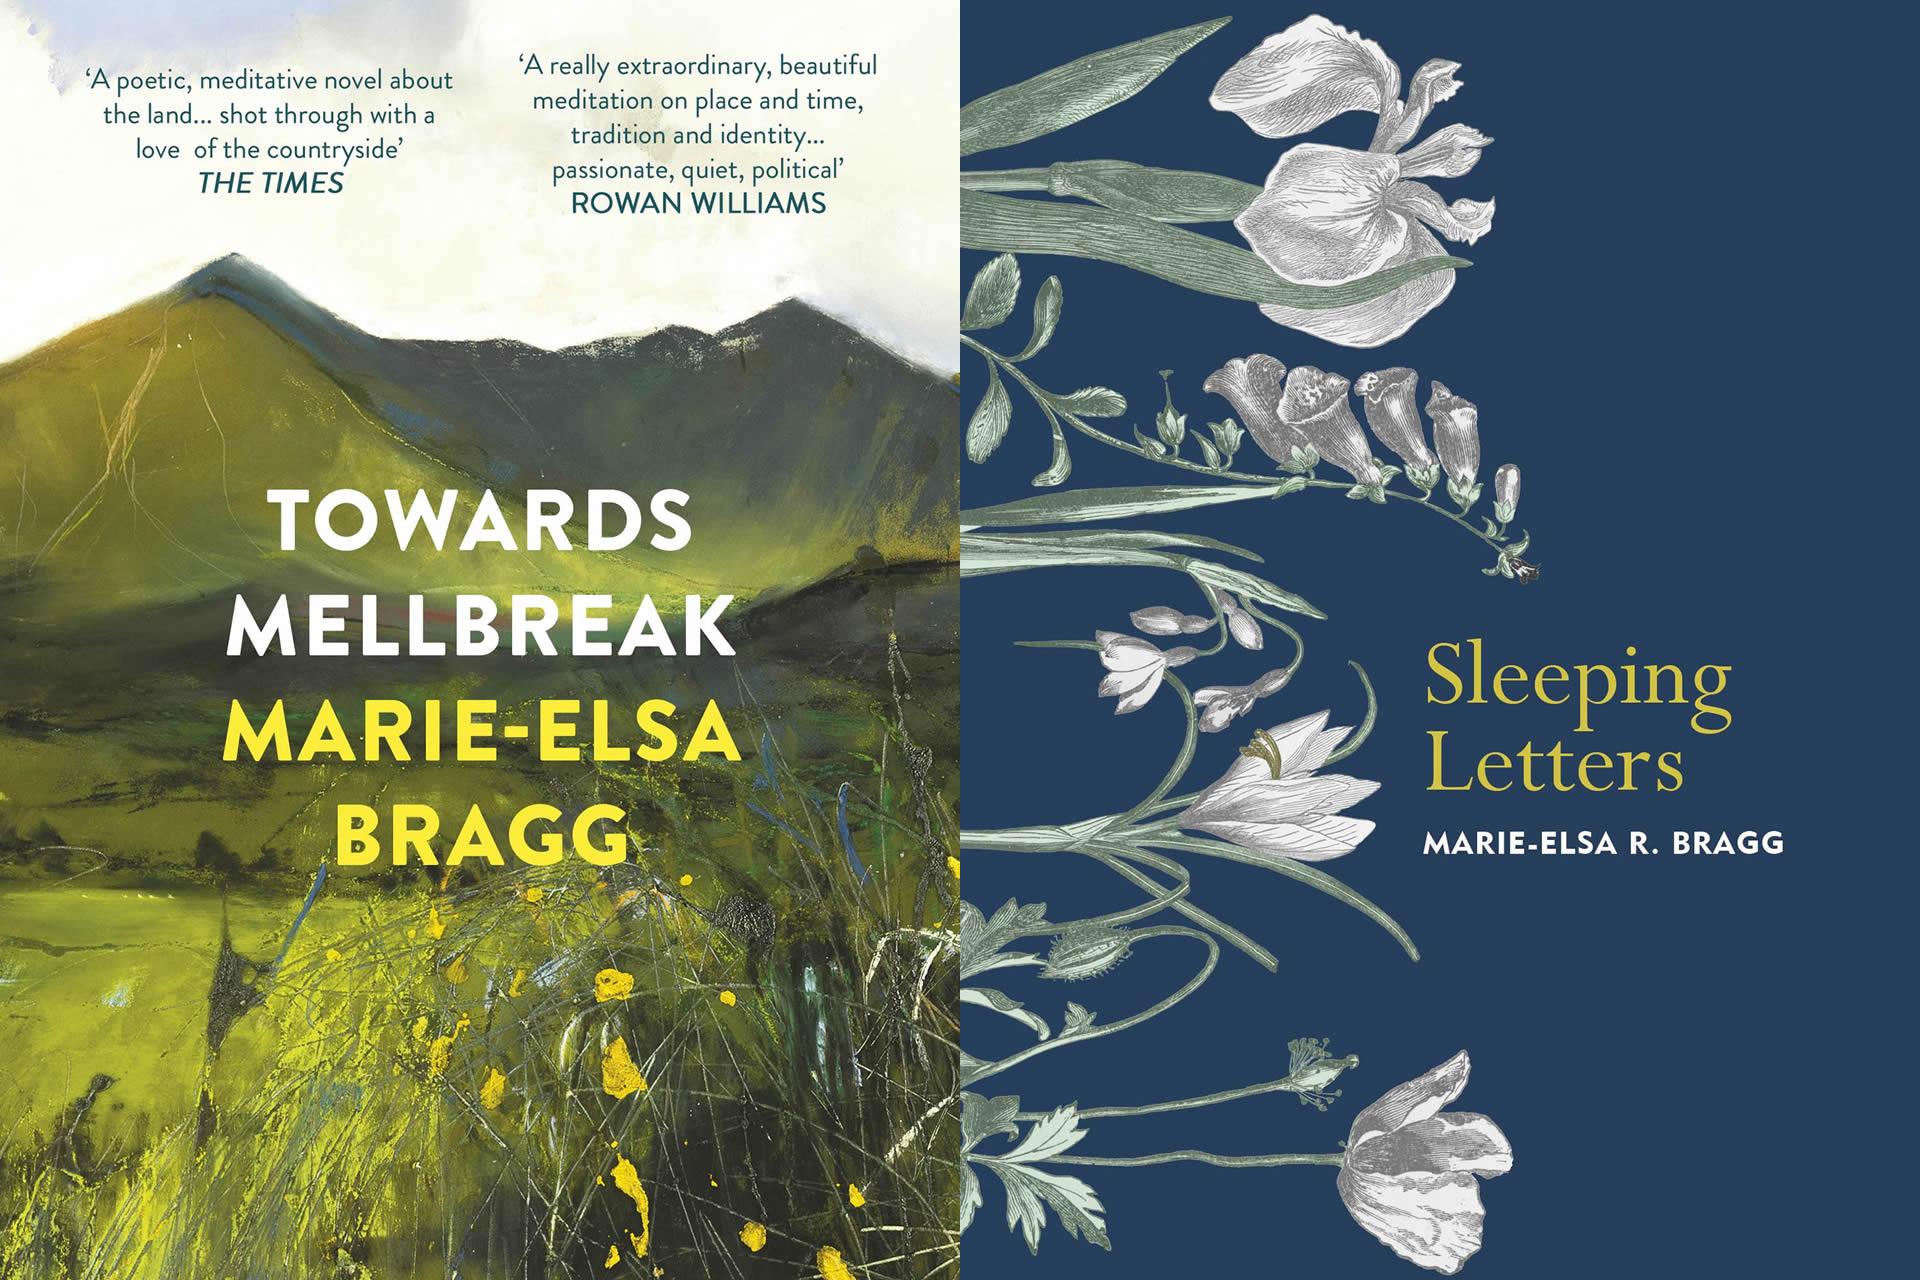 Books by Marie-Elsa Bragg